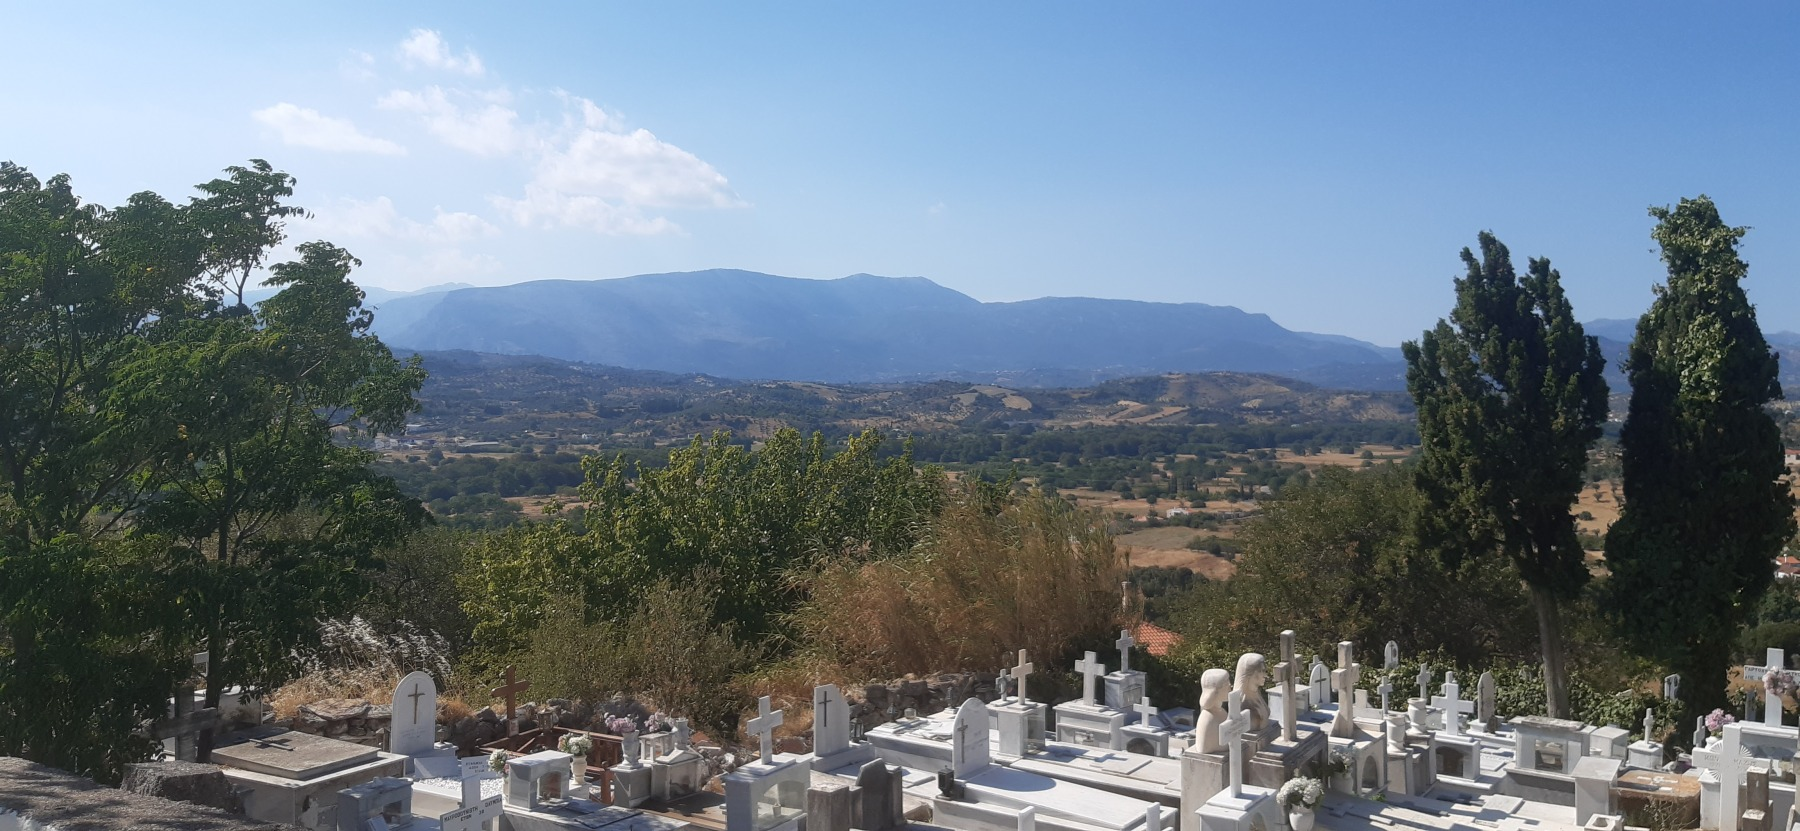 1_20200818_163125_Friedhof-am-berg